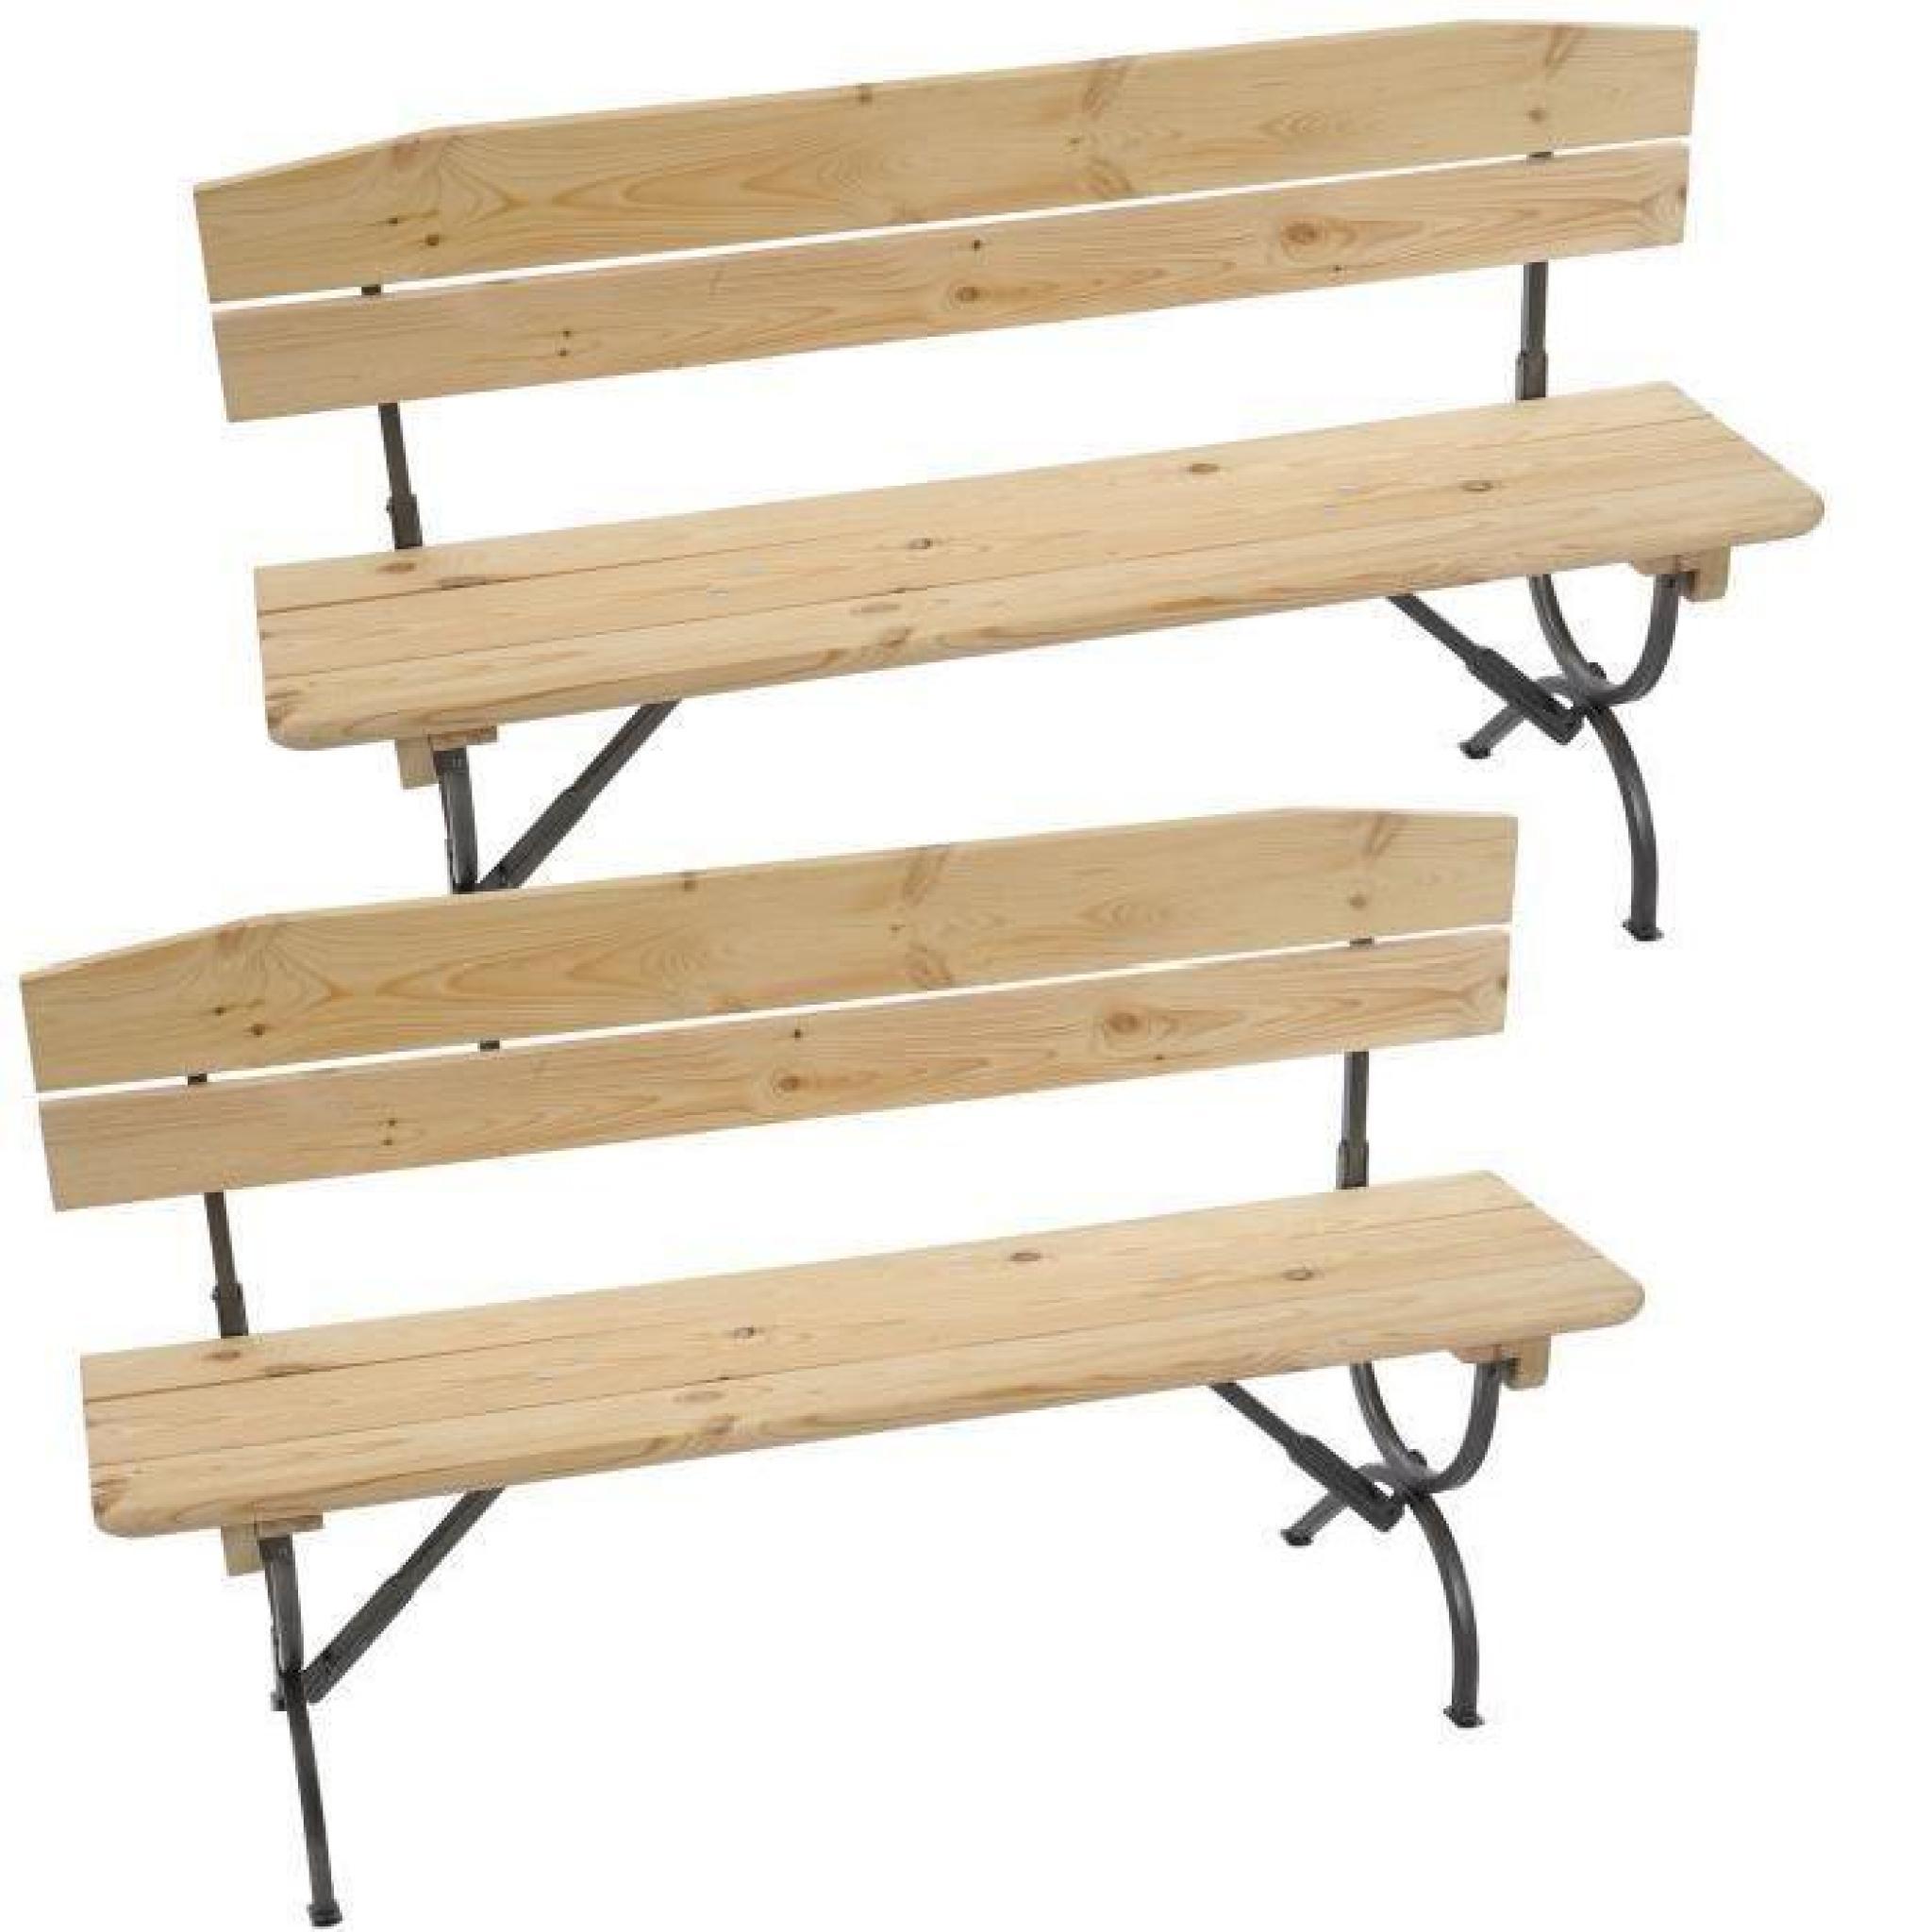 2x banc de jardin ou de brasserie linz av dossier for Banc de jardin en bois pas cher